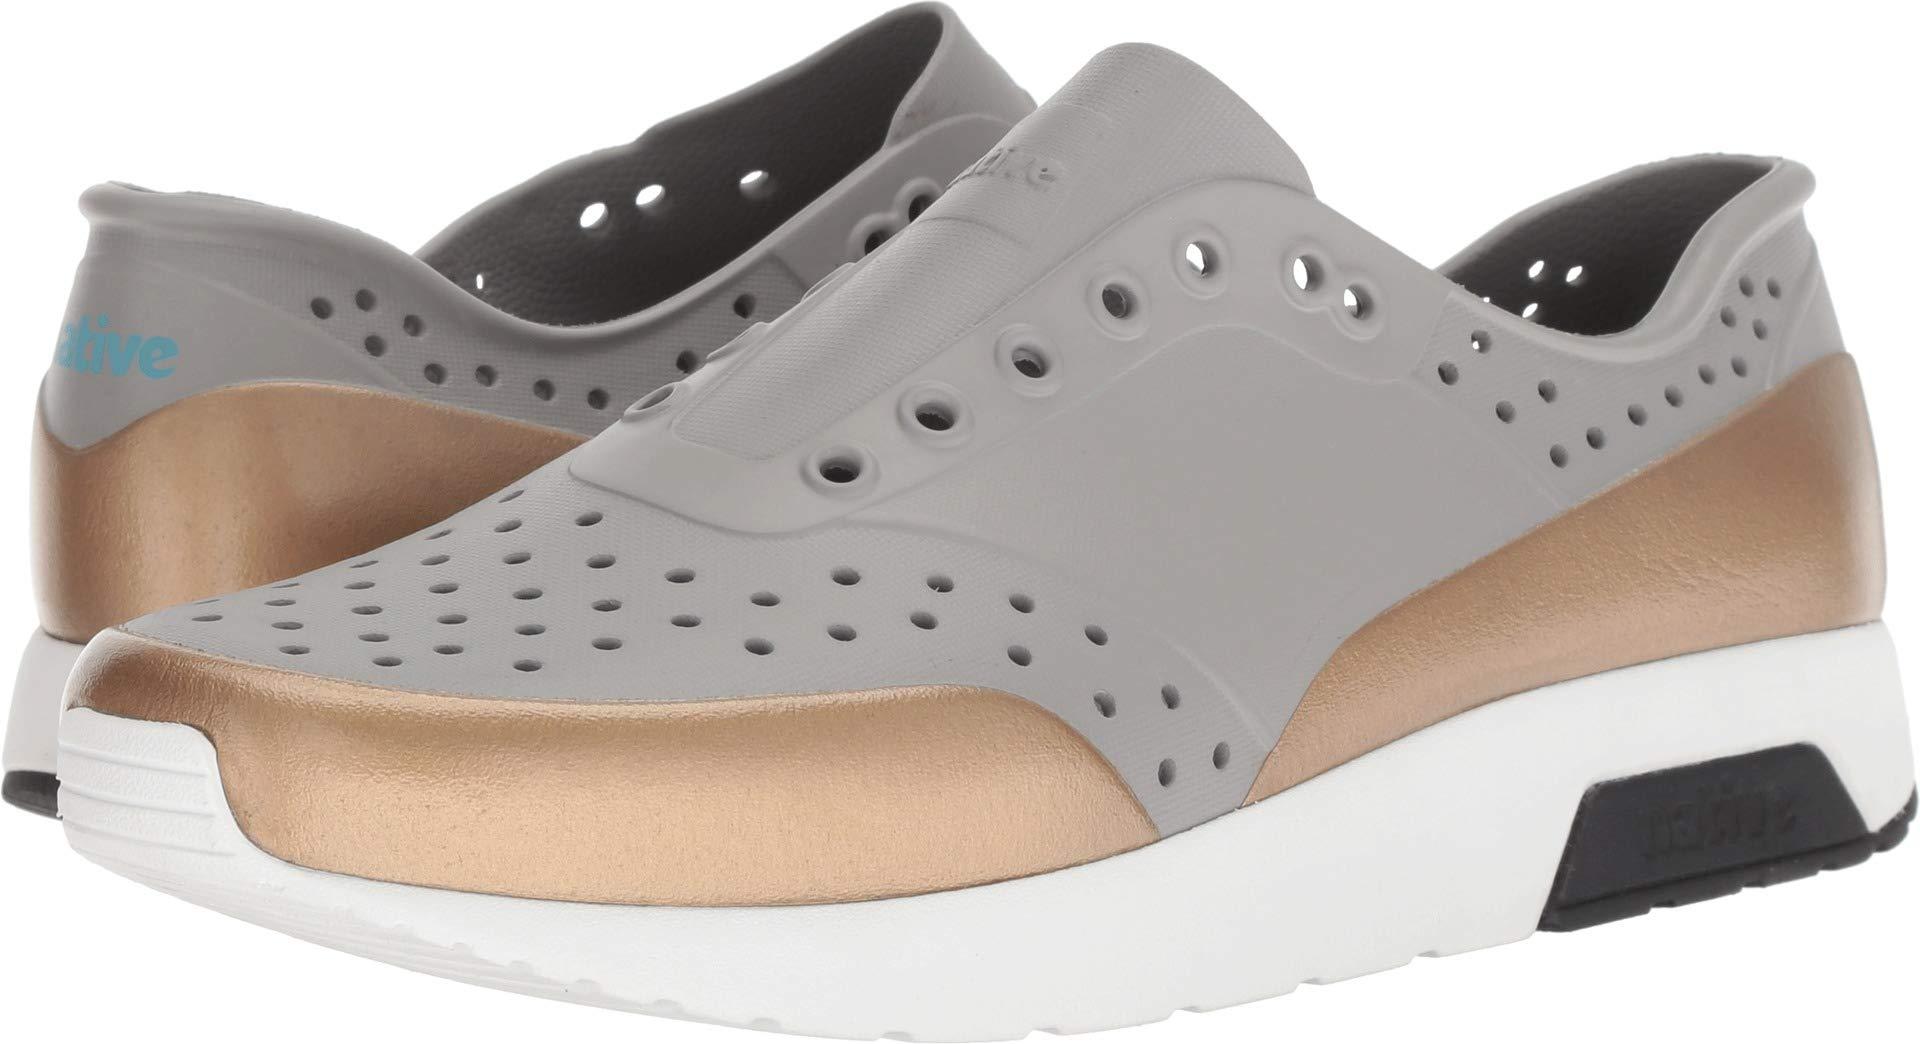 native Shoes Unisex Lennox Pigeon Grey/Shell White/Jiffy Black/Rose Gold Block 6 Women / 4 Men M US